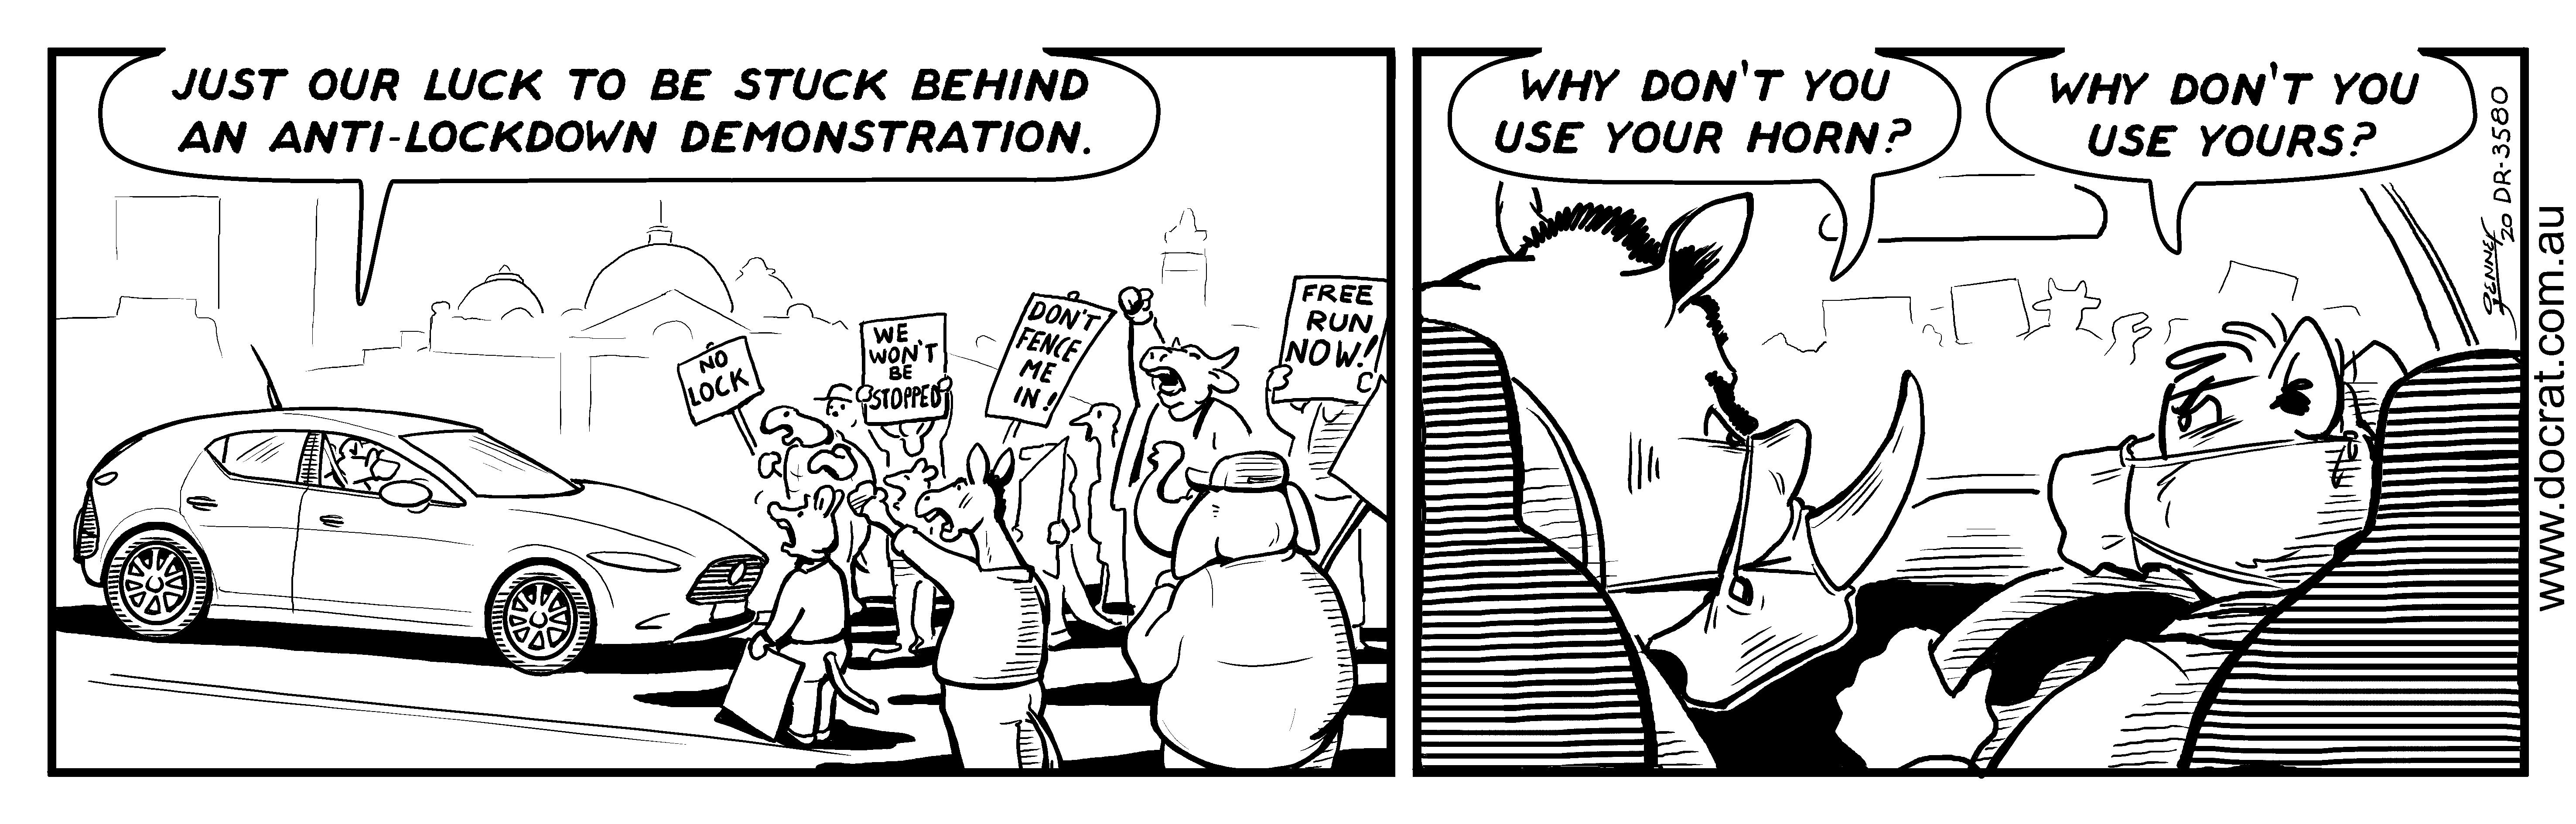 20201002